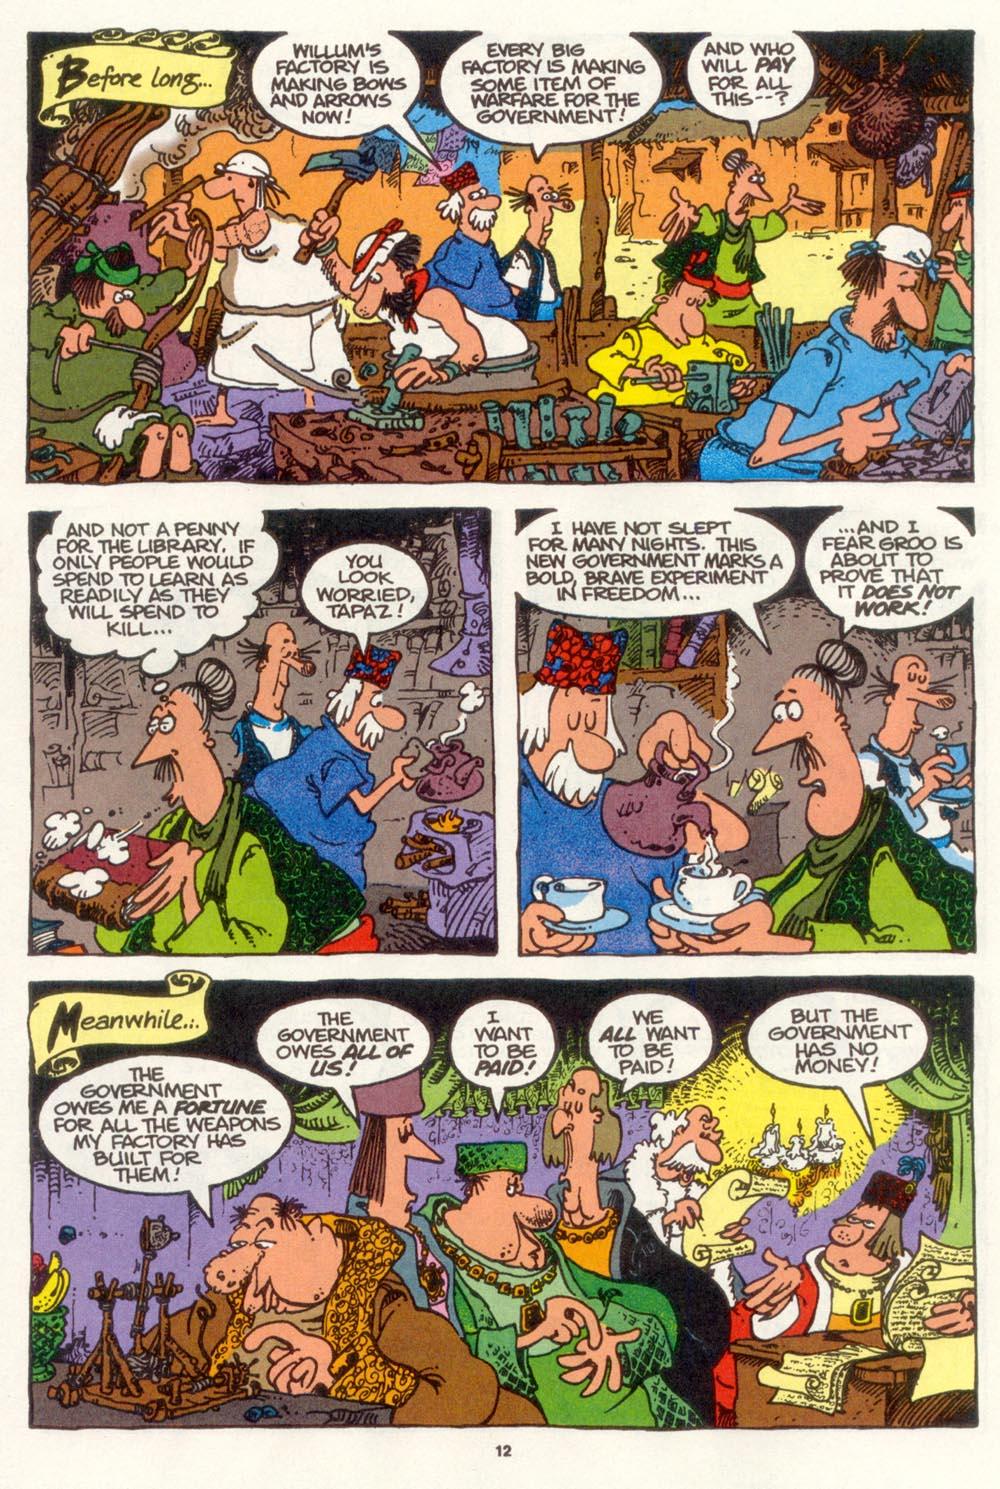 Read online Sergio Aragonés Groo the Wanderer comic -  Issue #109 - 14